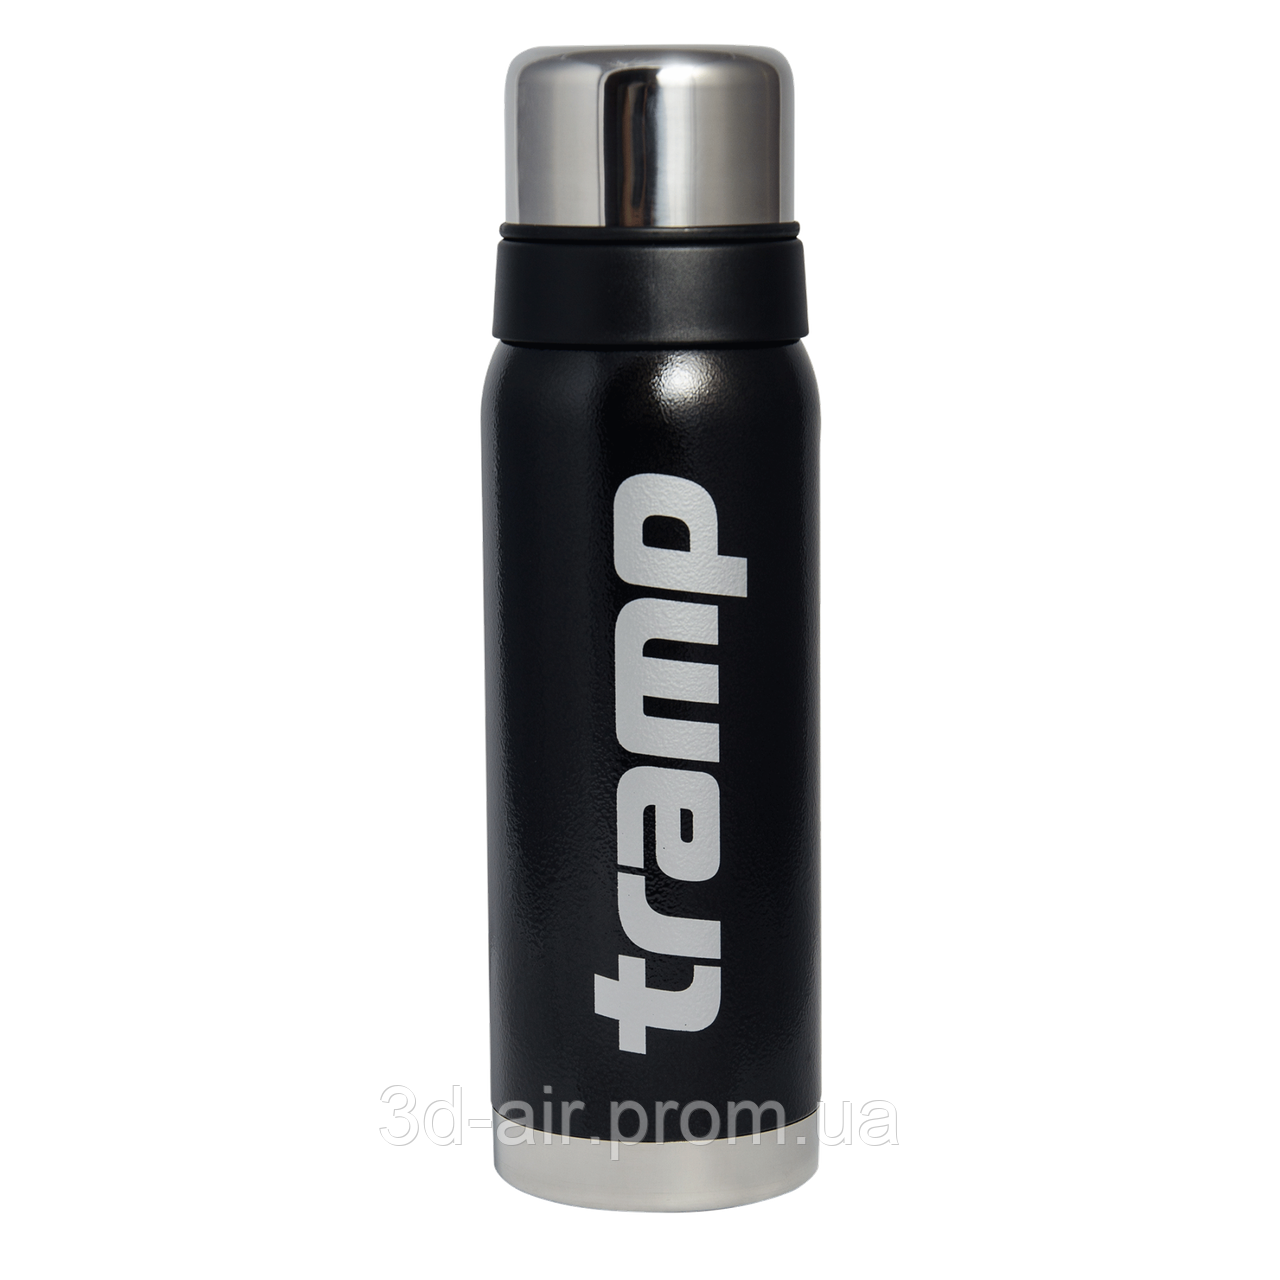 Термос Tramp 0,75 л TRC-031